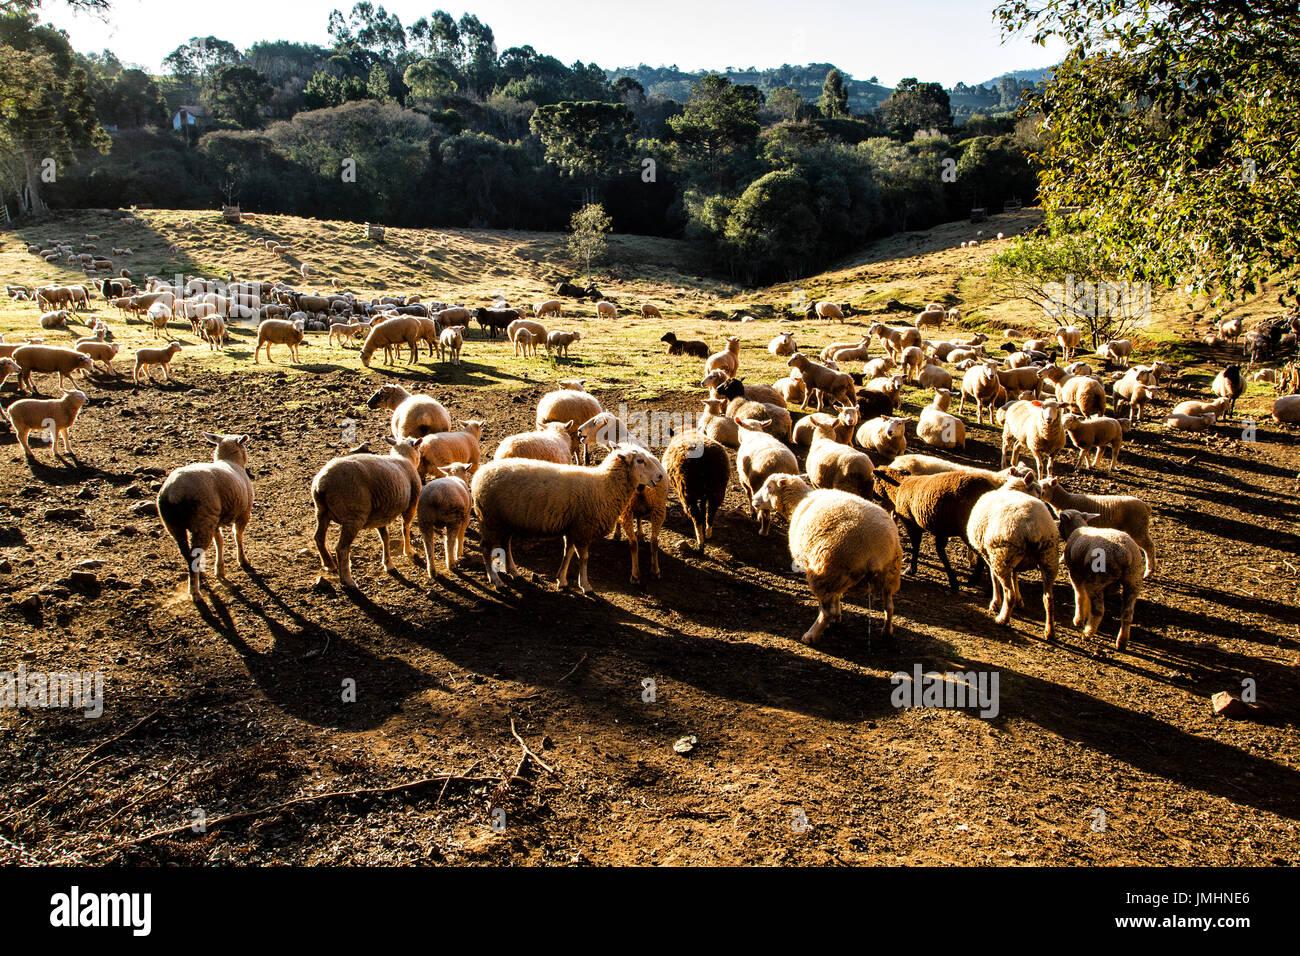 Sheep husbandry at Linha Babenberg. Treze Tilias, Santa Catarina, Brazil. - Stock Image